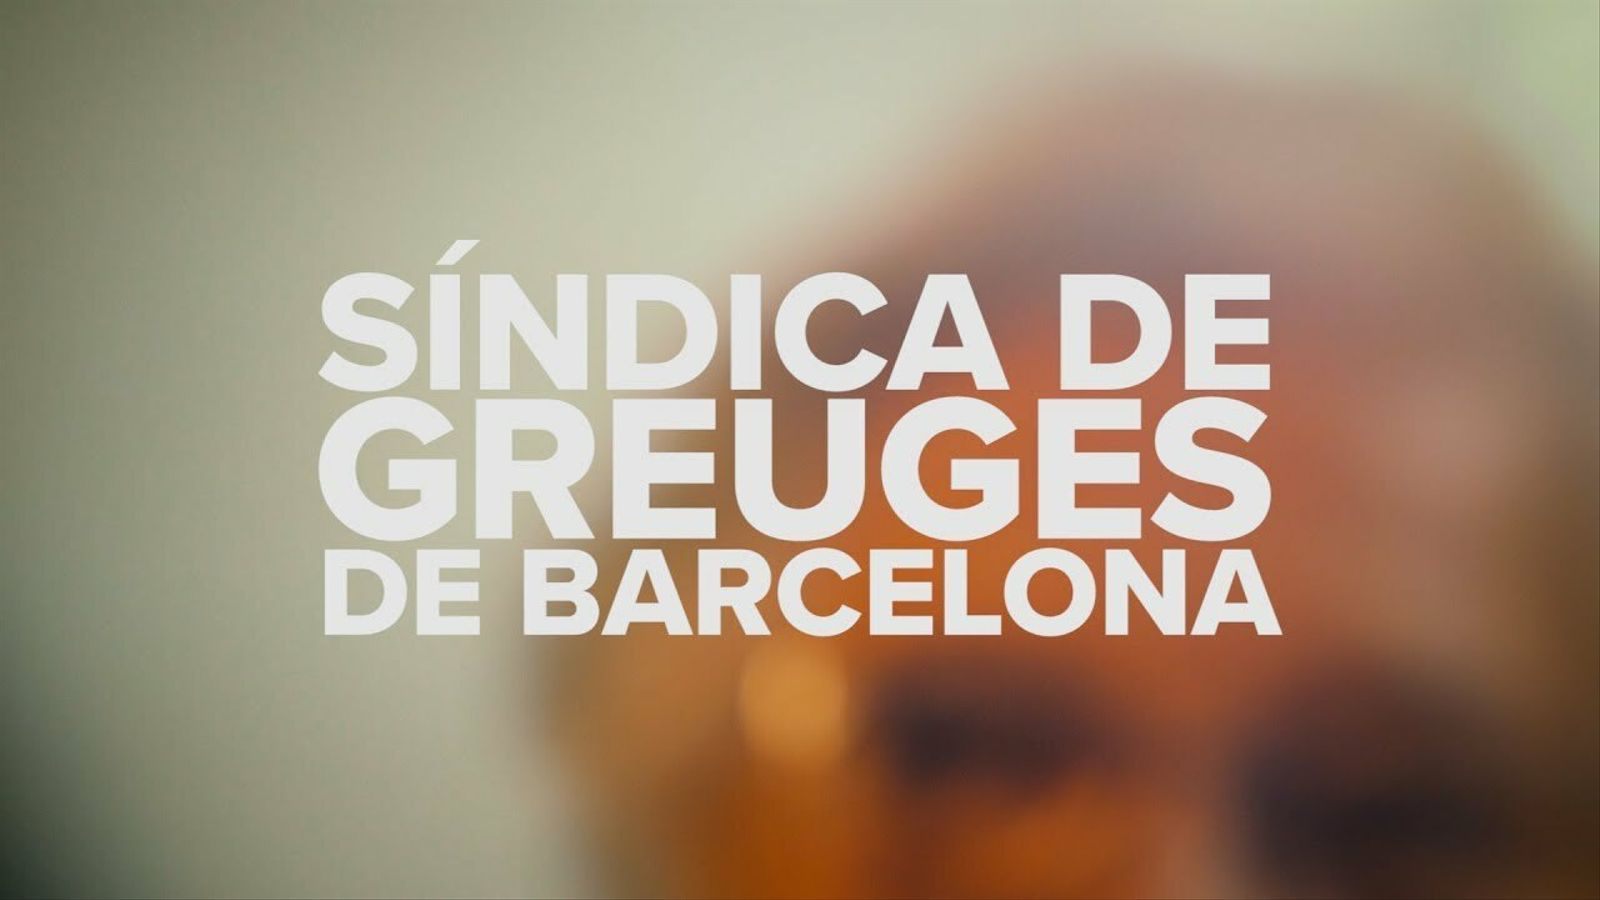 Síndica de Barcelona